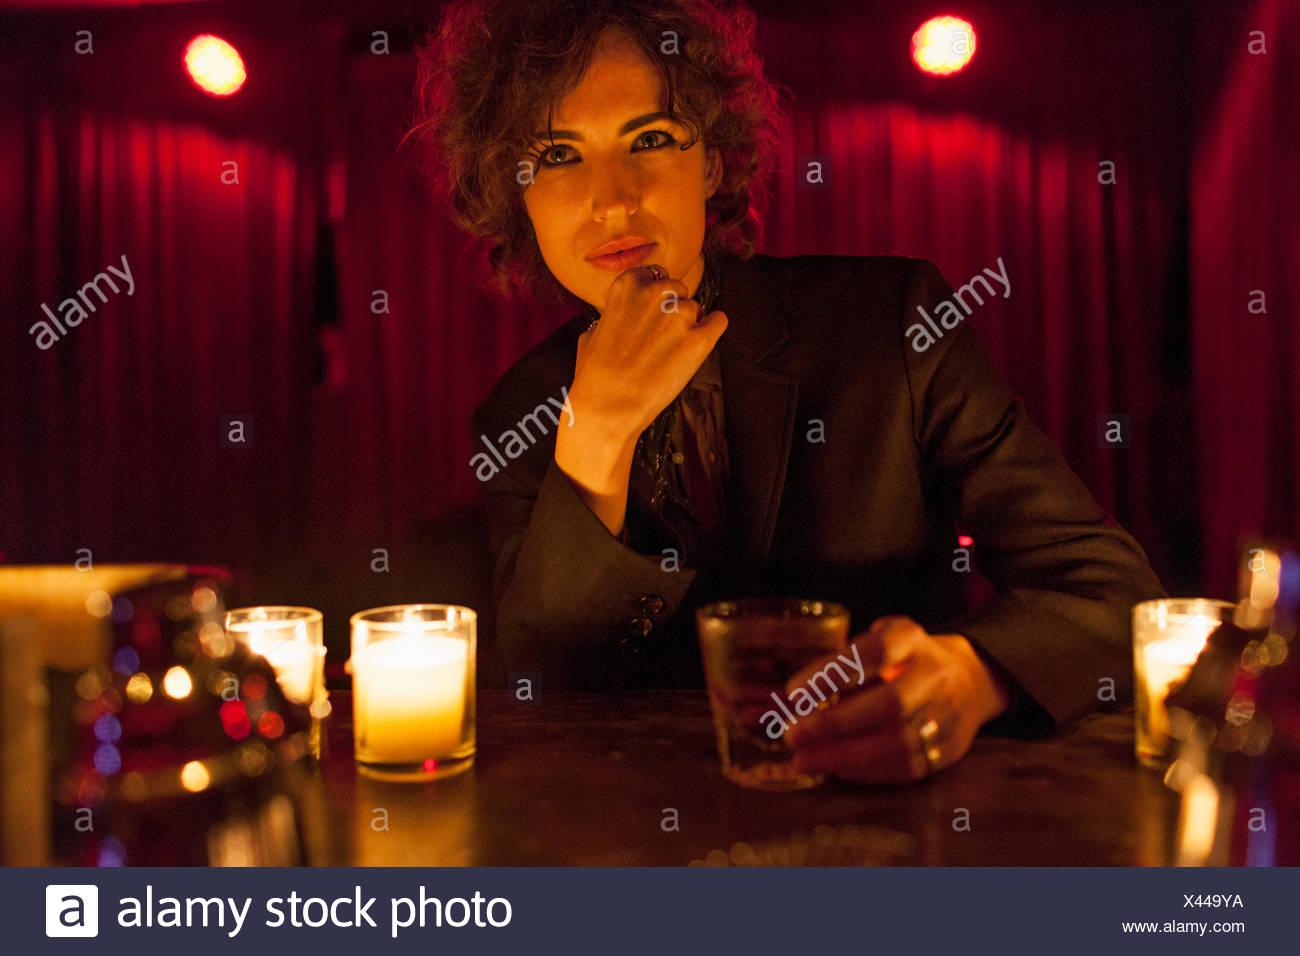 Woman enjoying a drink at a bar - Stock Image